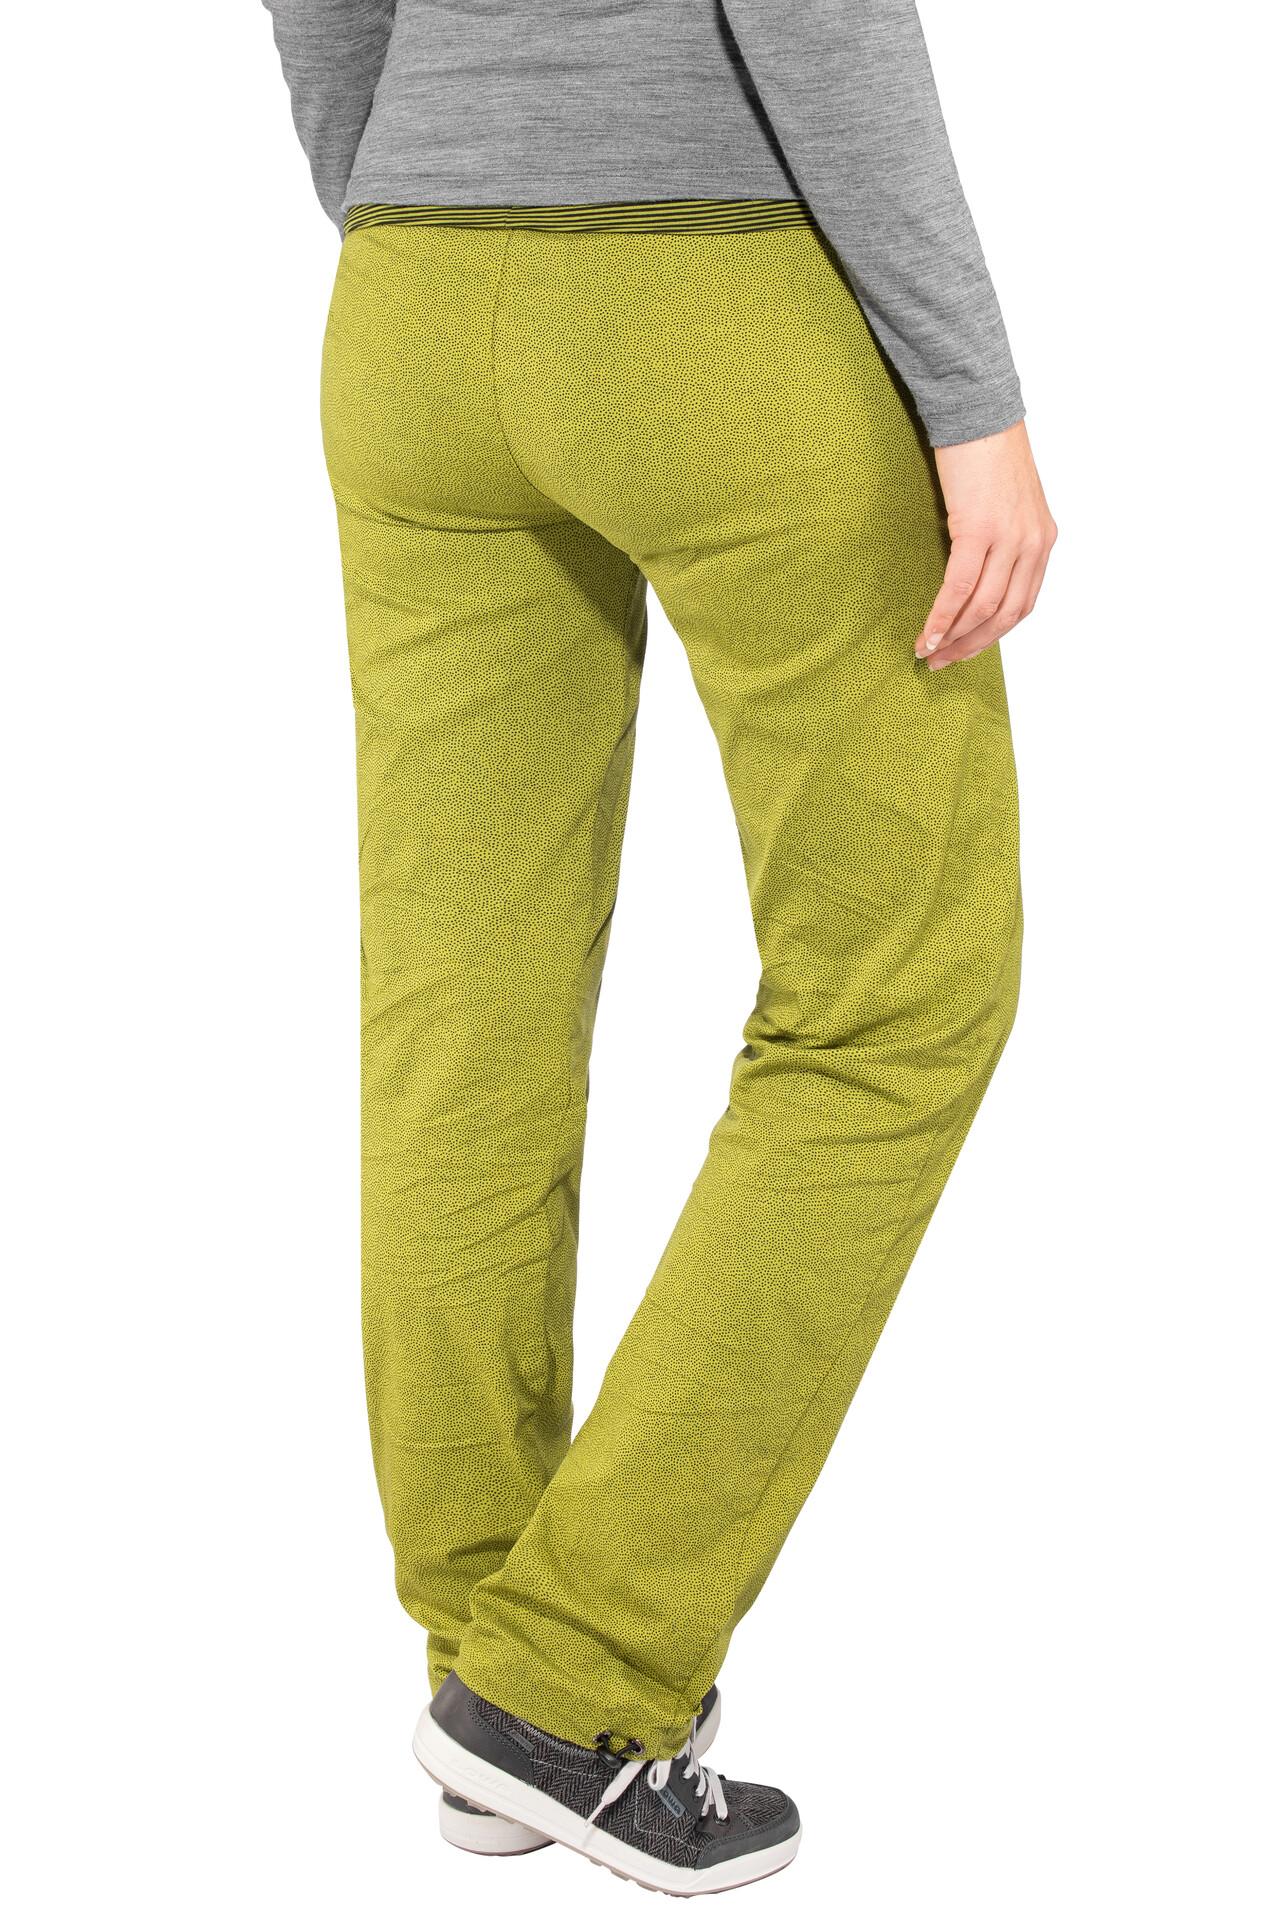 Trekking Andre Pantalones Mujer verde de E9 qUt418t c64122b9a289